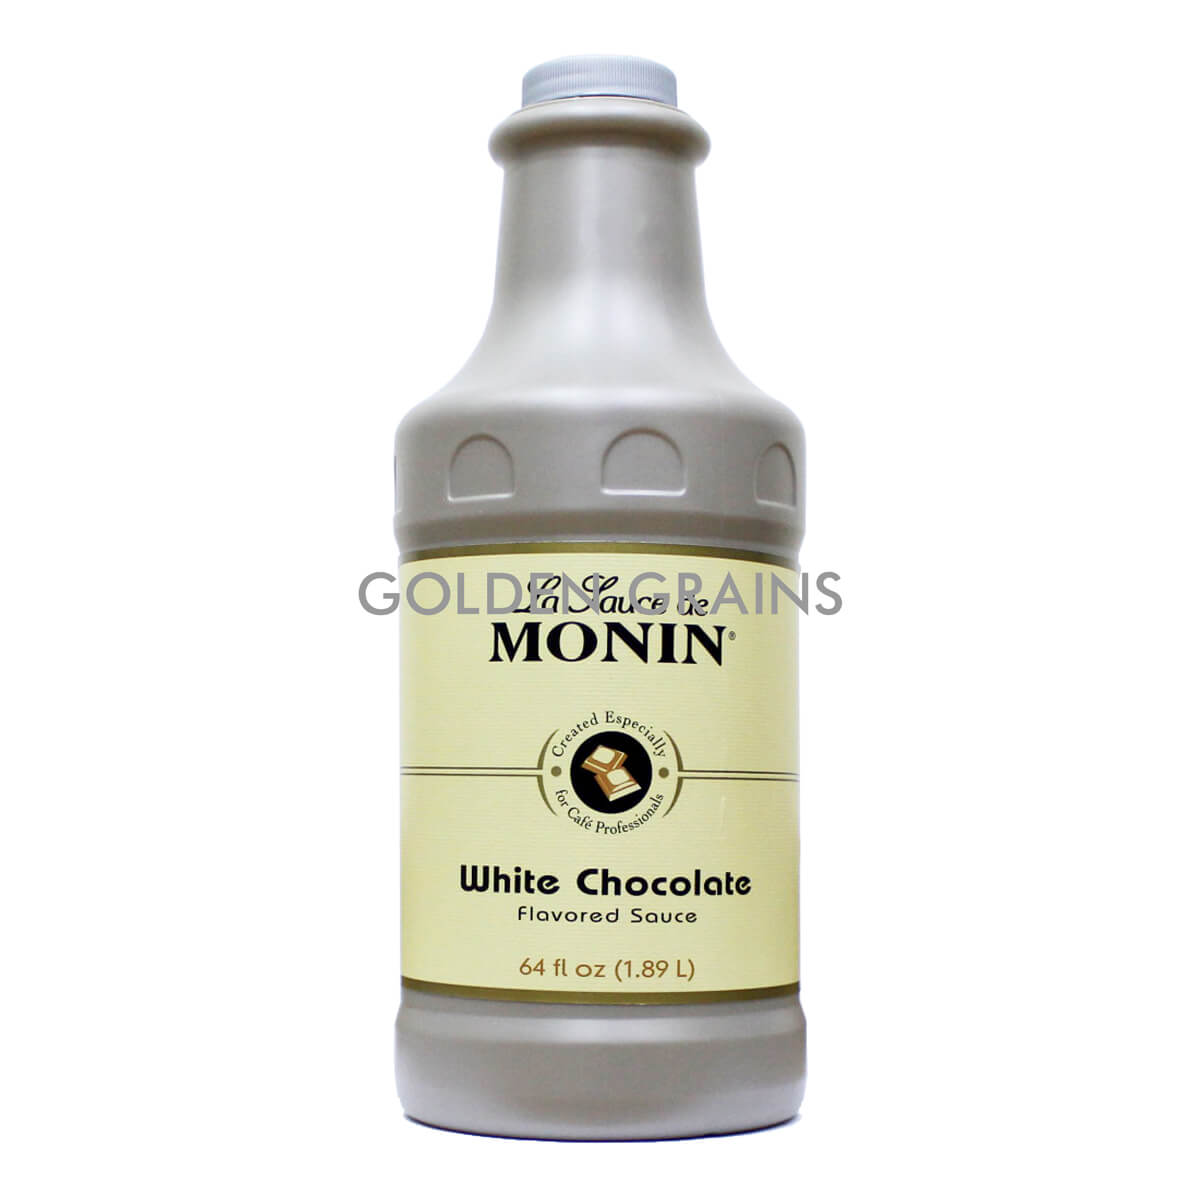 Golden Grains Monin - White Chocolate - Front.jpg